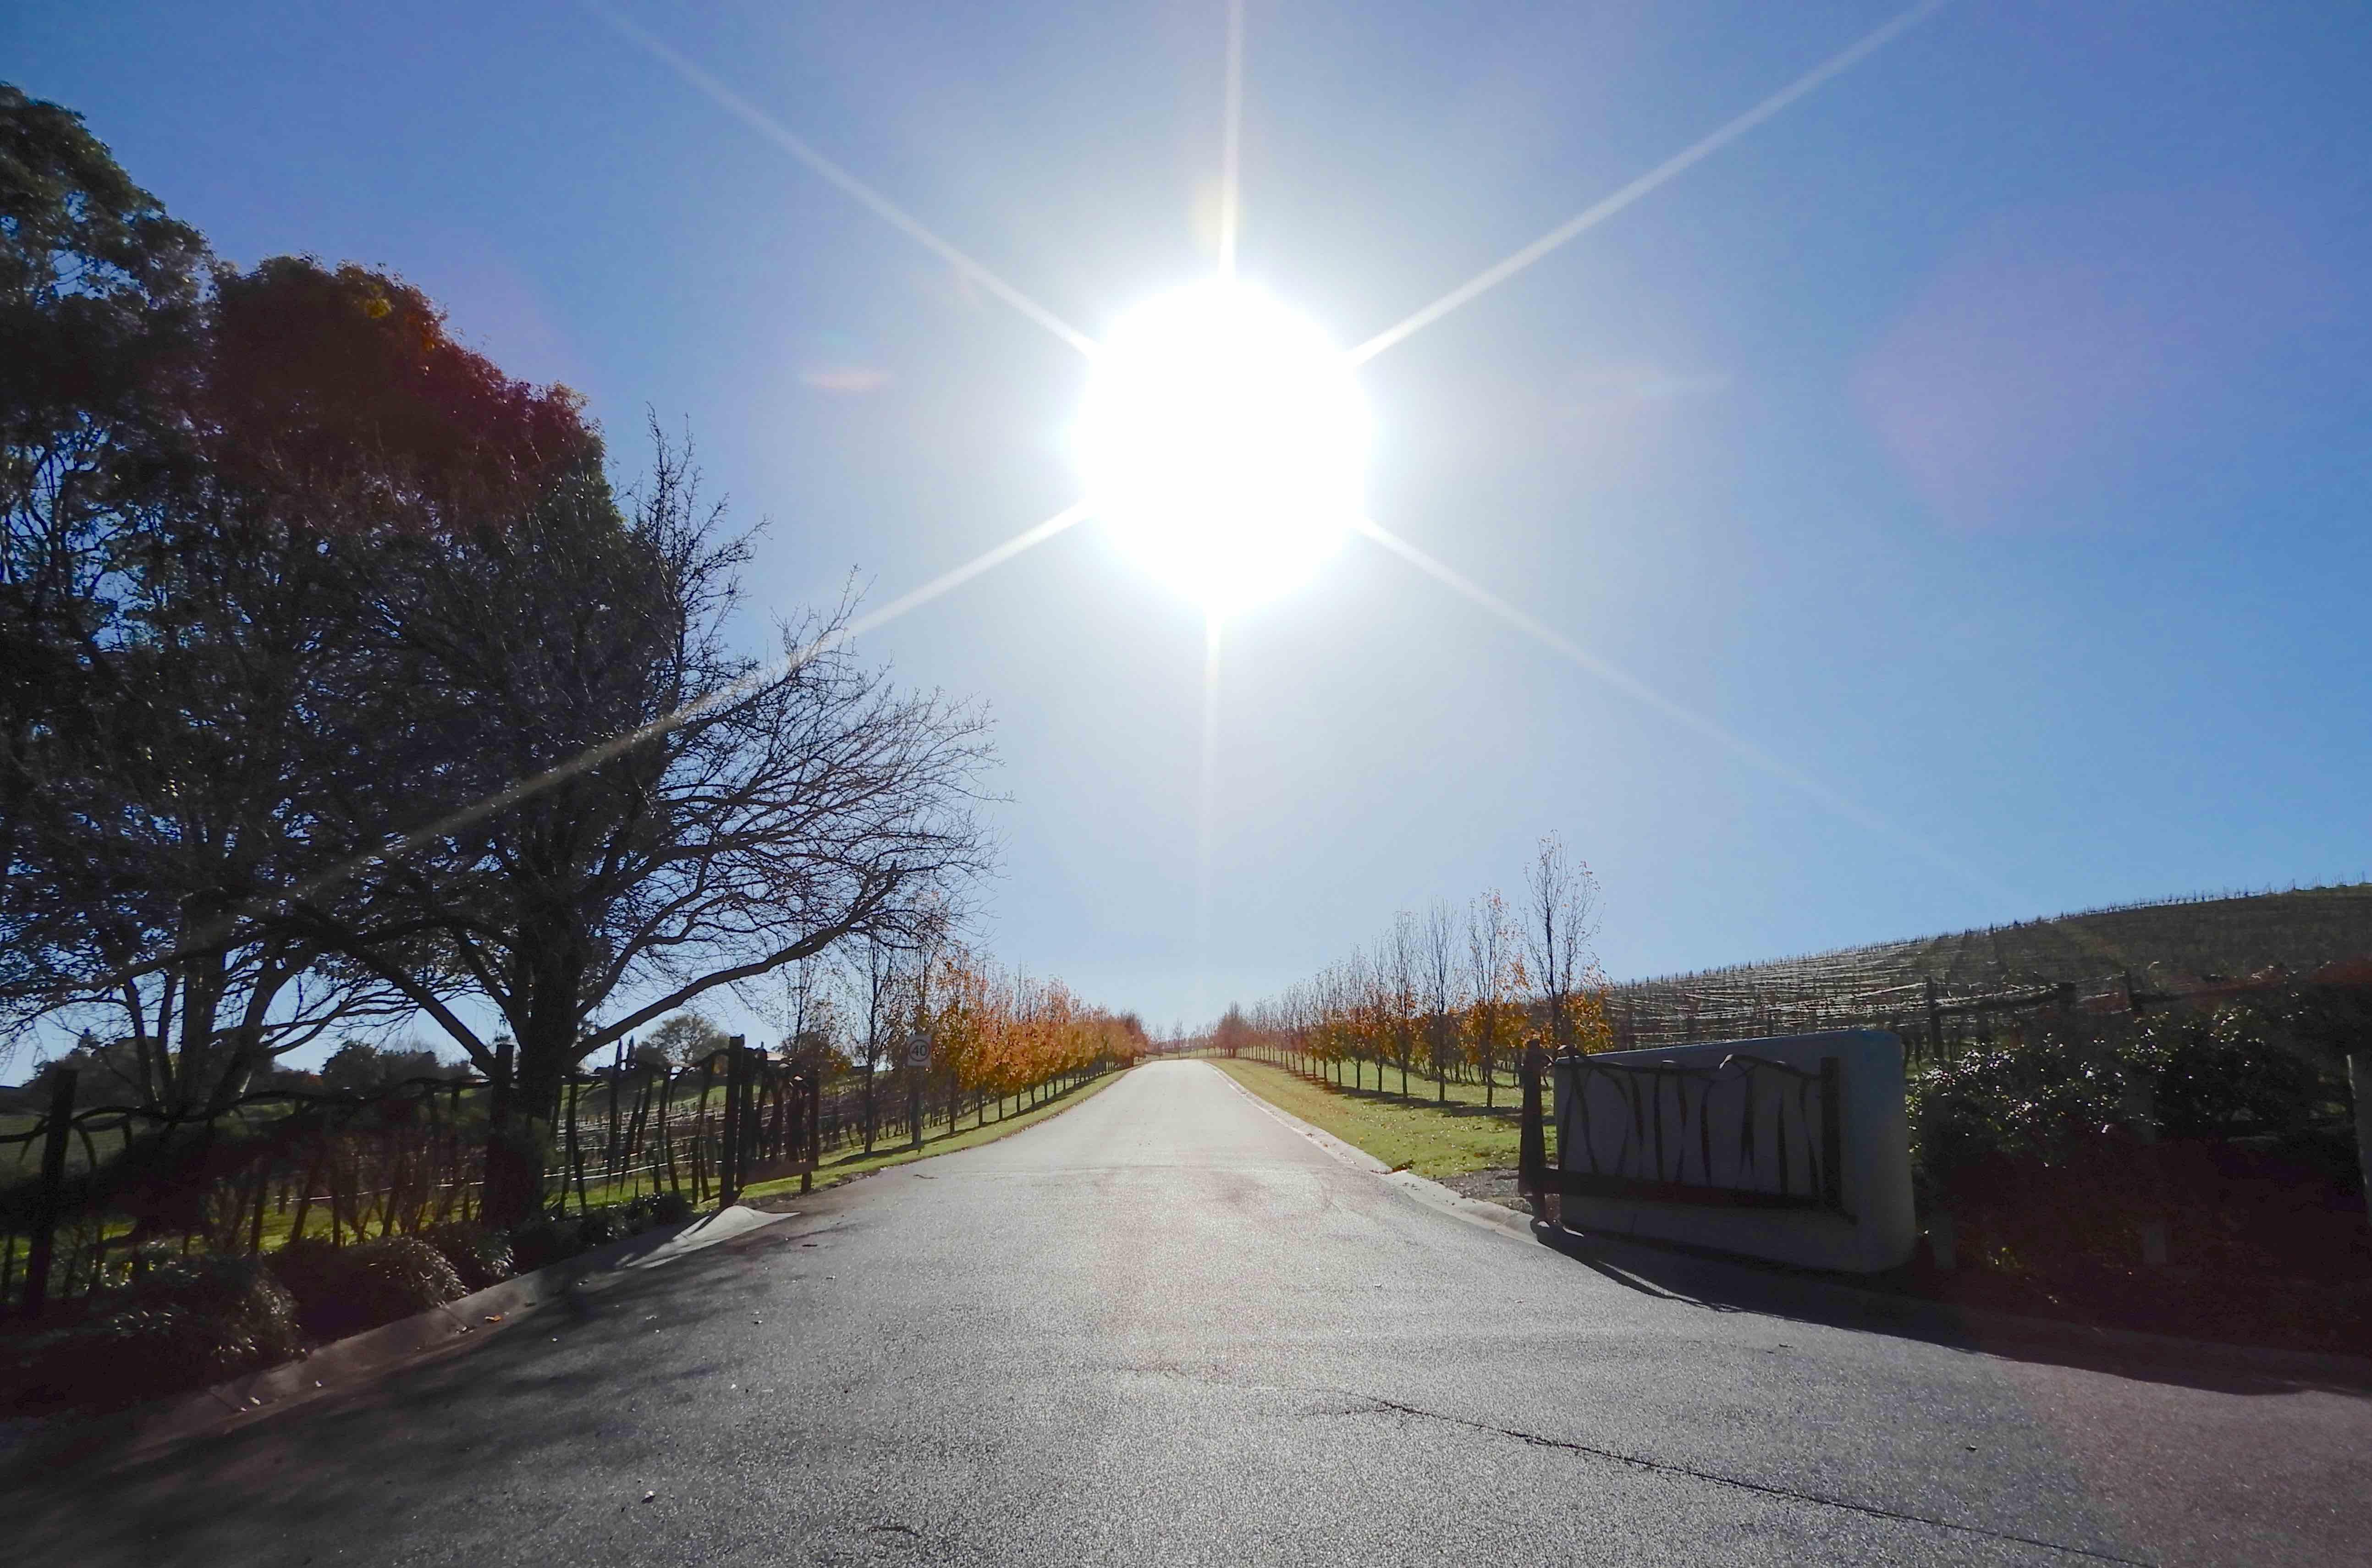 3.DeBortoli driveway